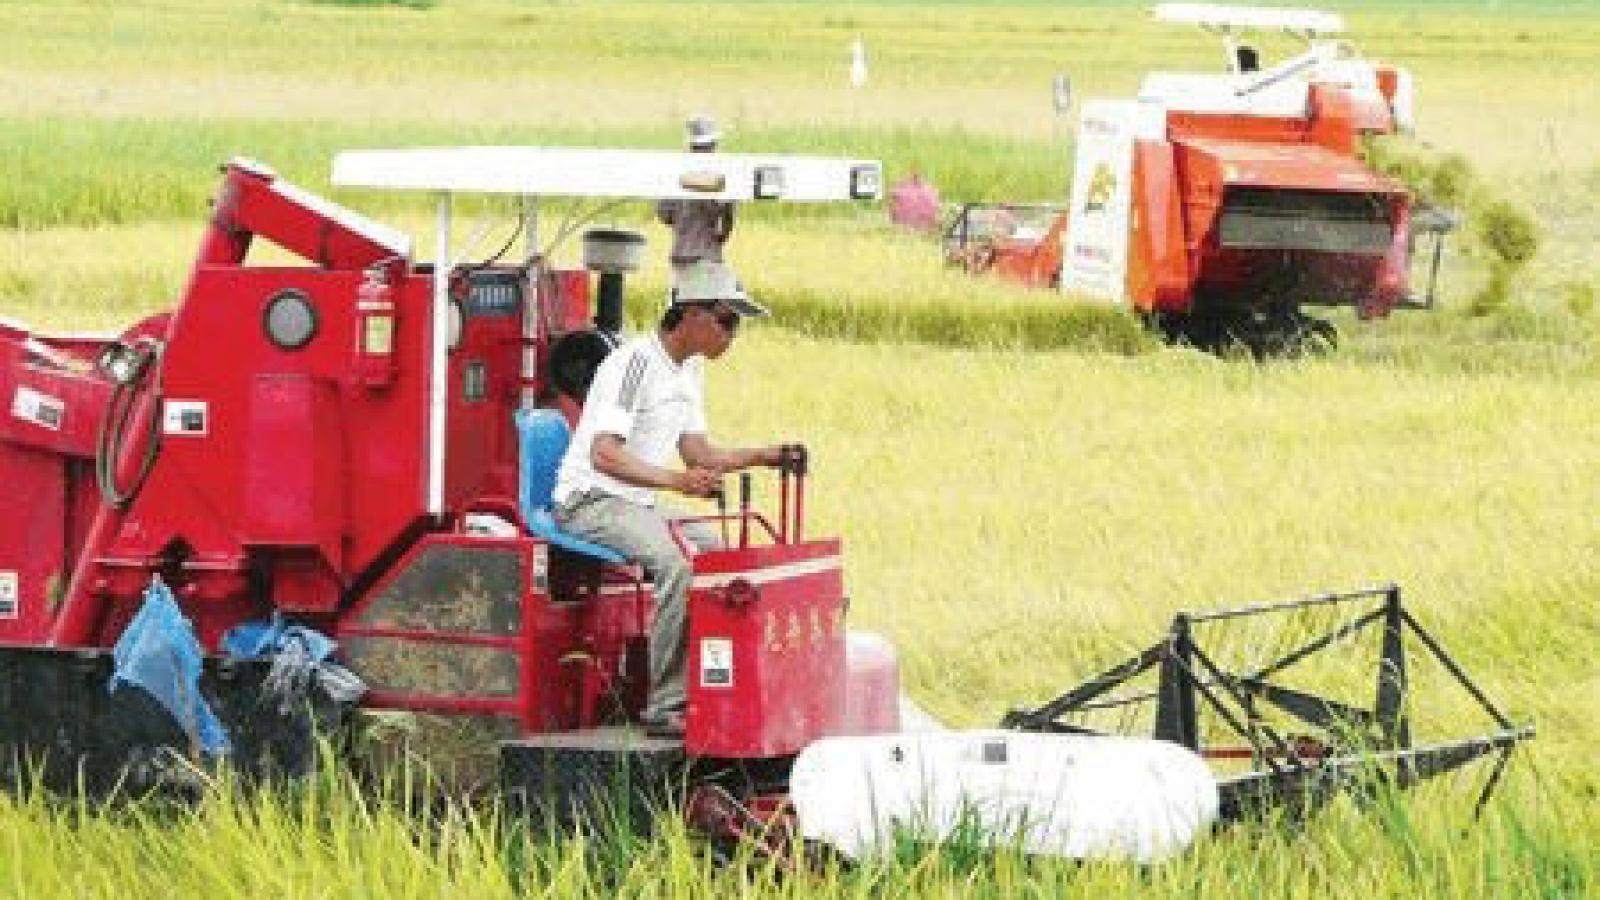 Mekong Delta should build logistics chains to boost exports